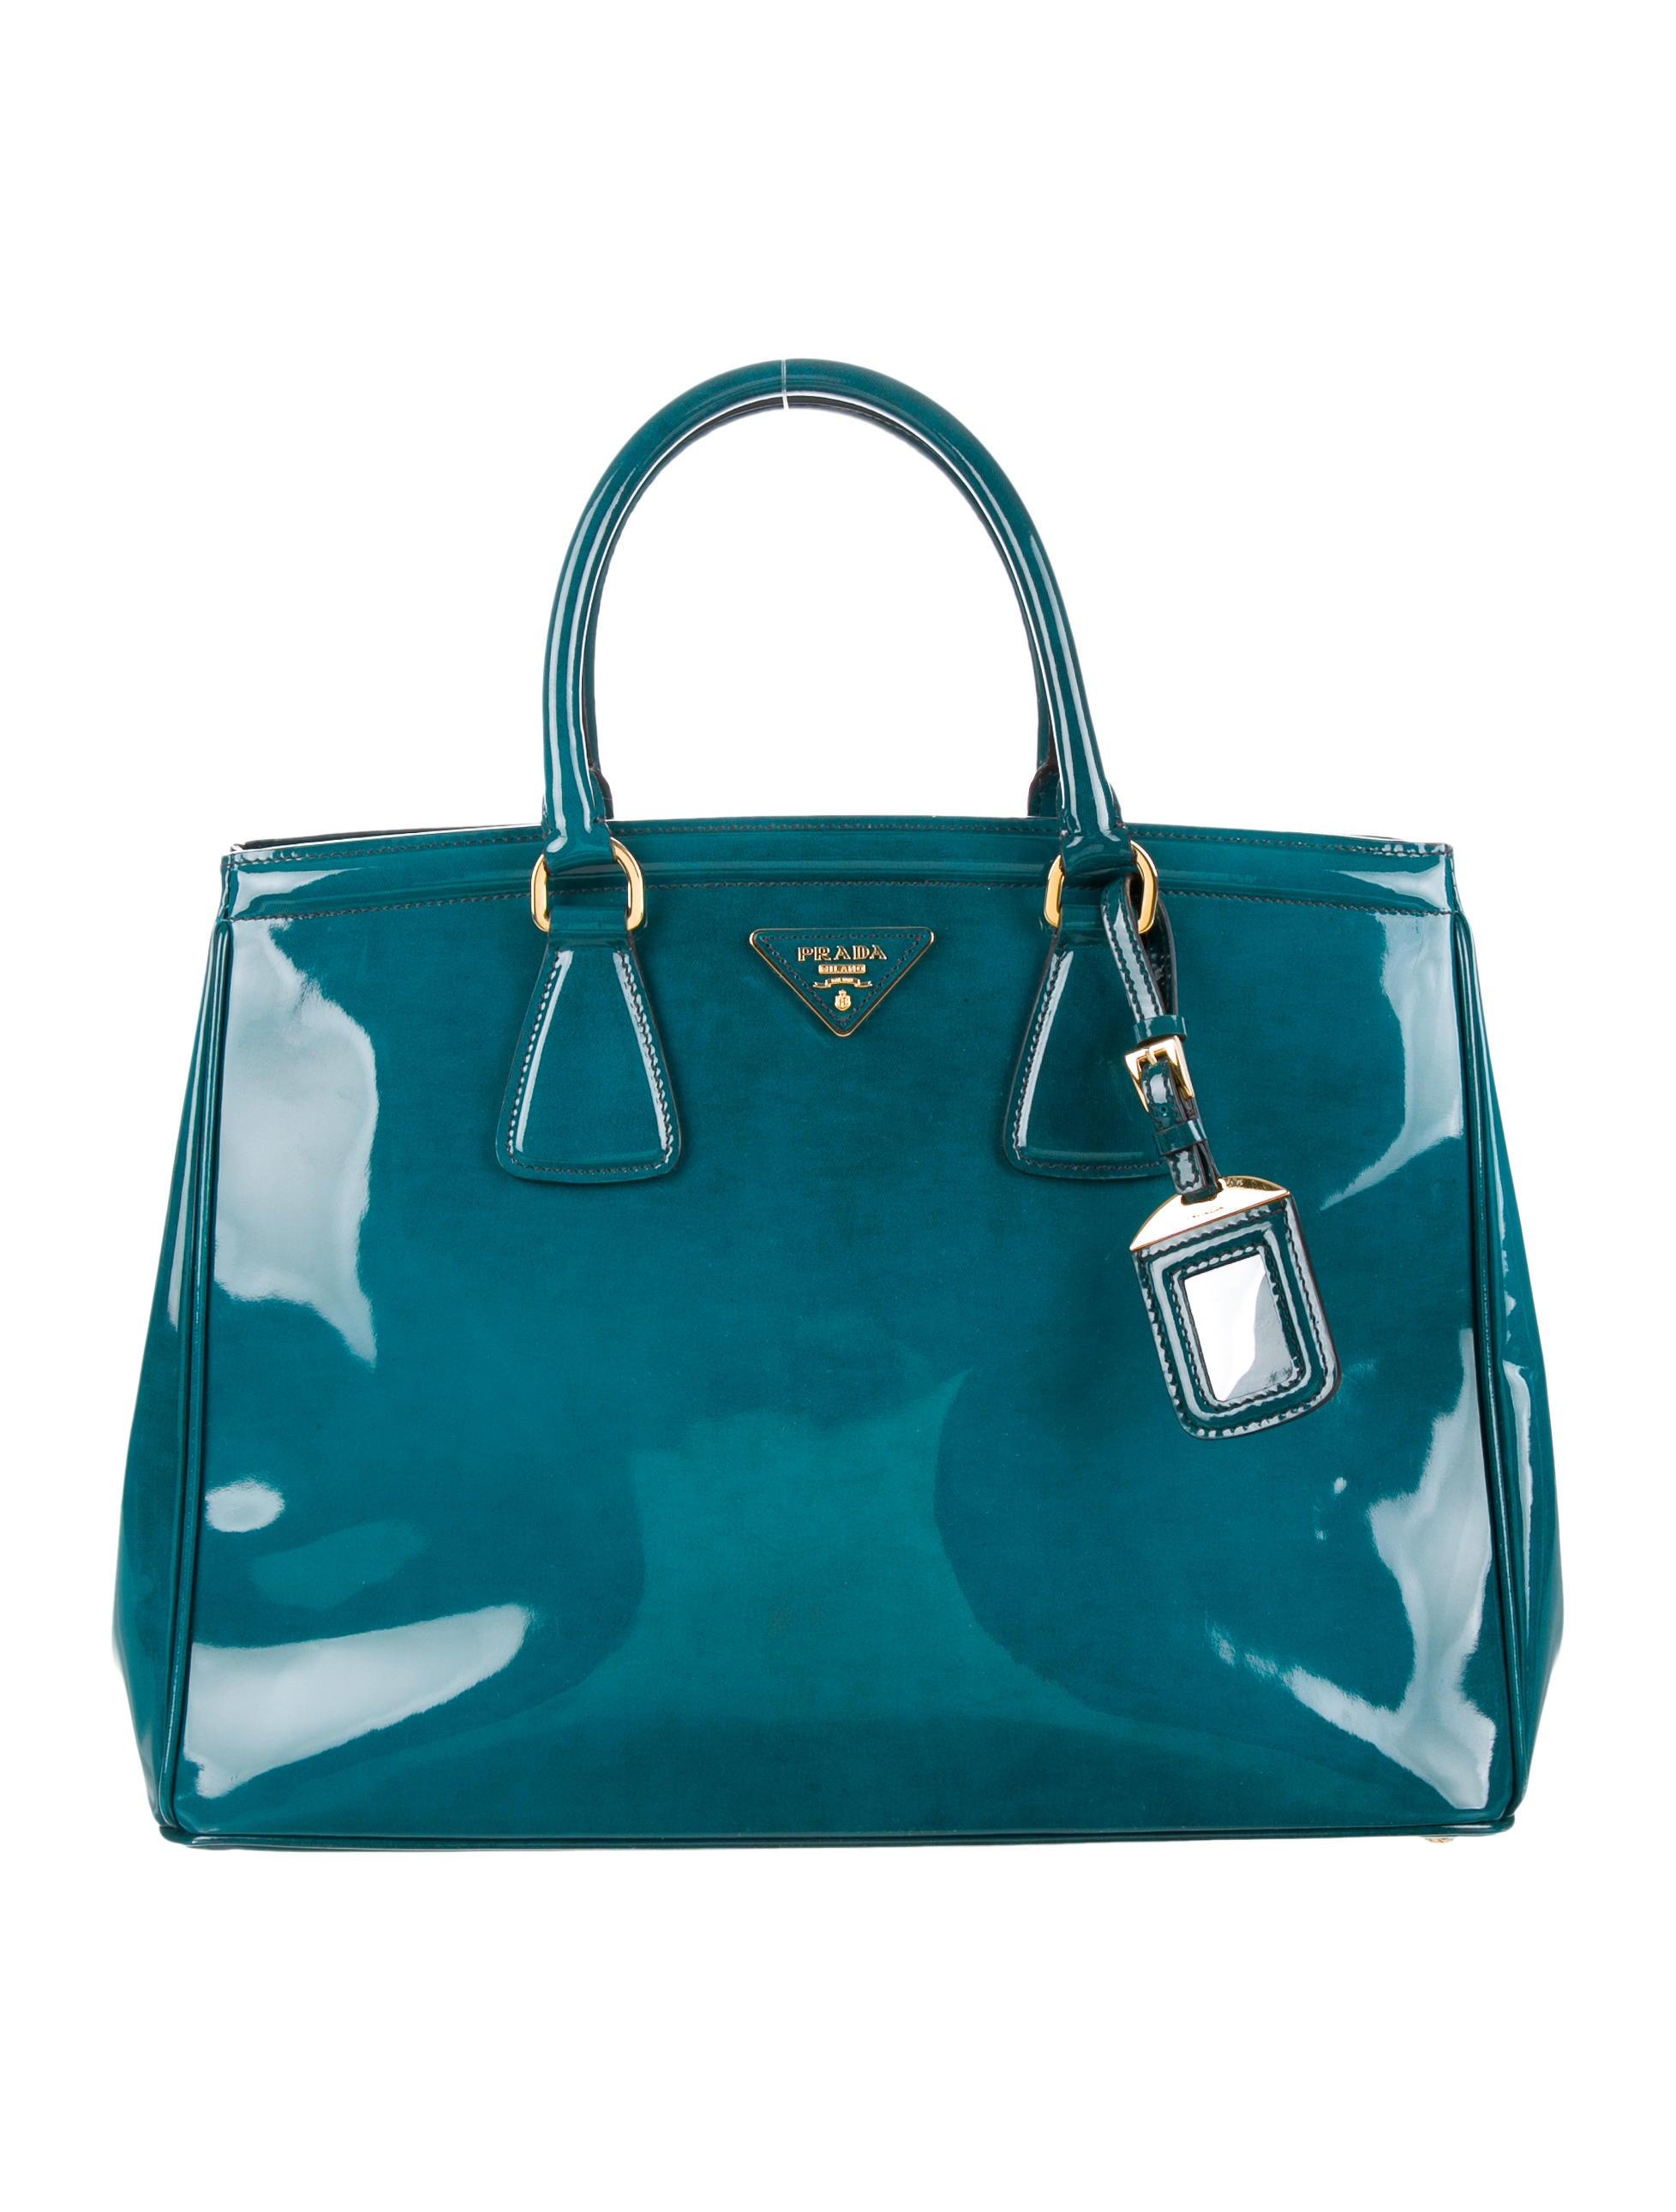 5df488941d Prada Spazzolato Parabole Tote - Handbags - PRA122872